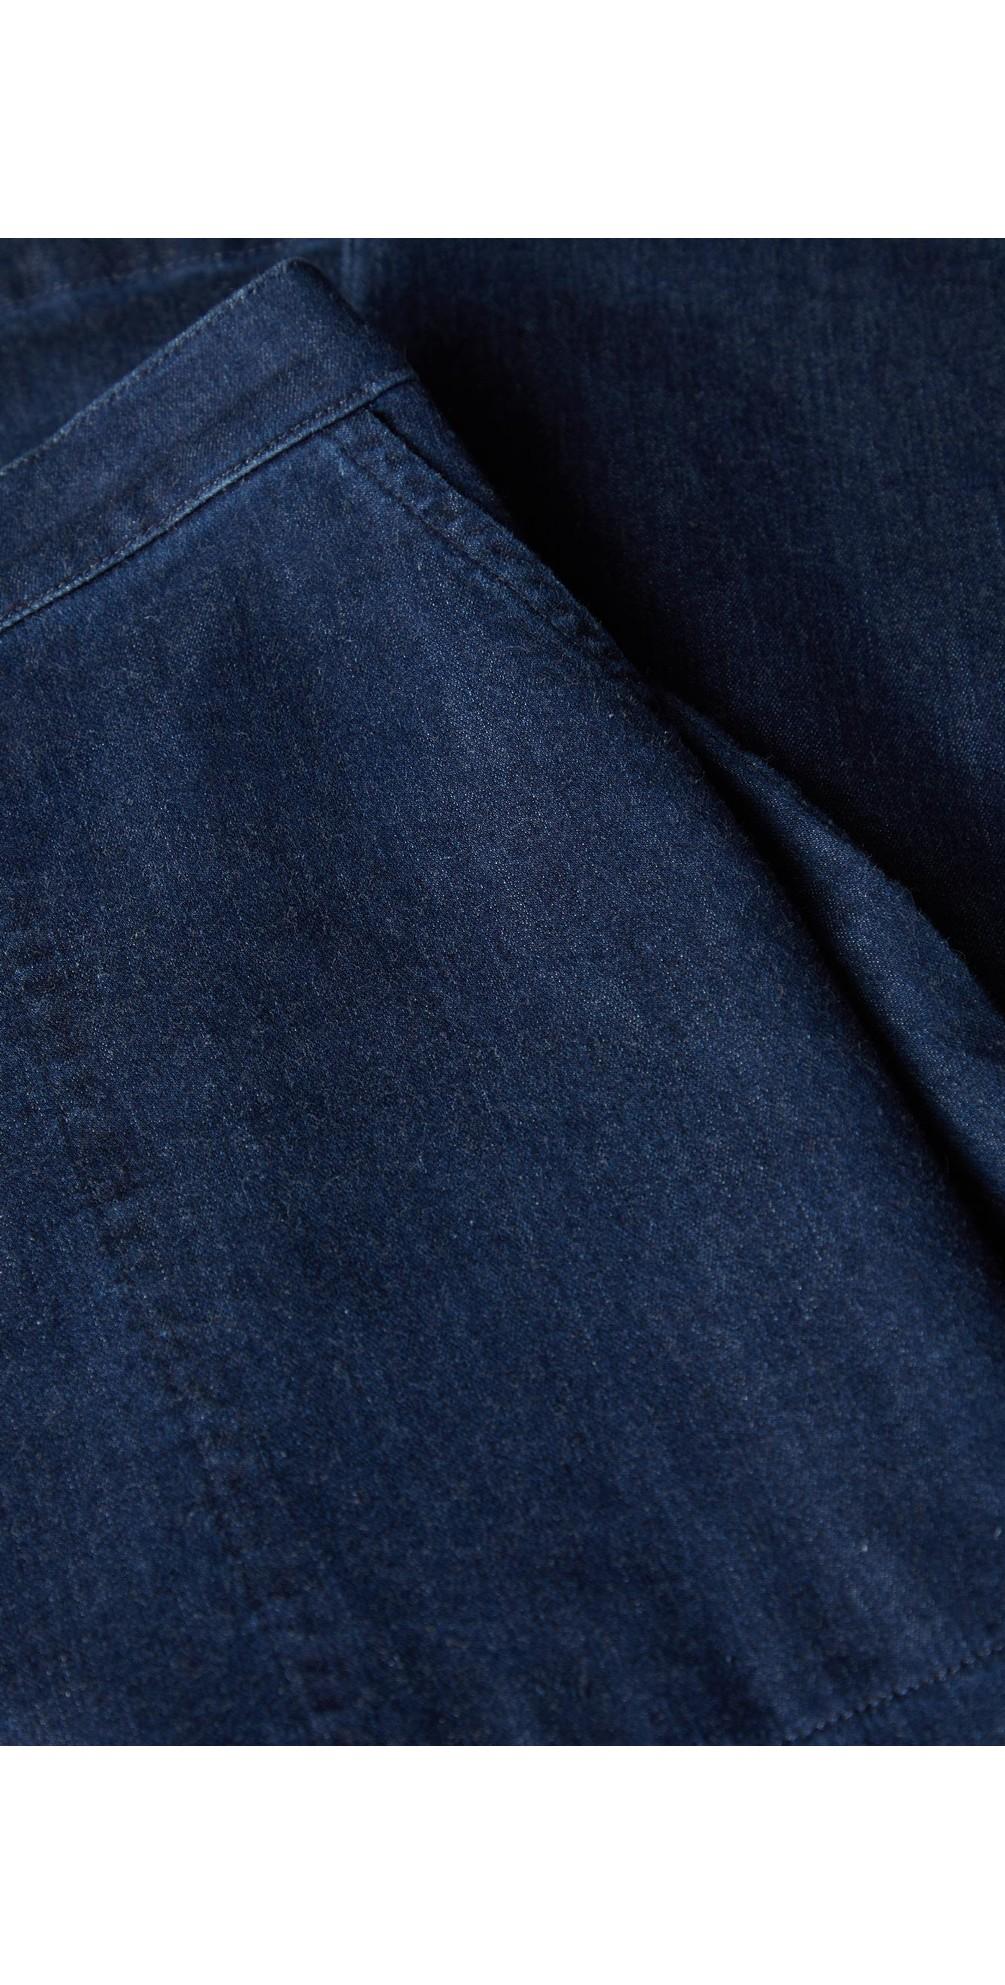 Stretch Denim Straight Trouser main image